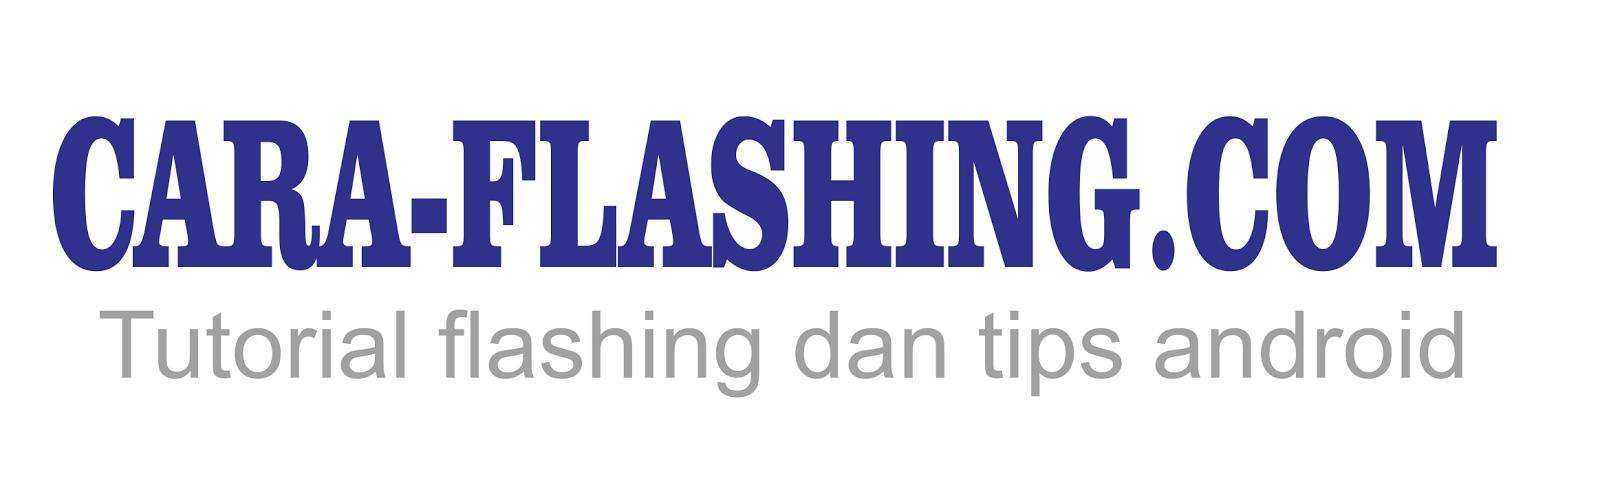 CARA-FLASHING.COM - Tutorial Flashing dan Tips Android